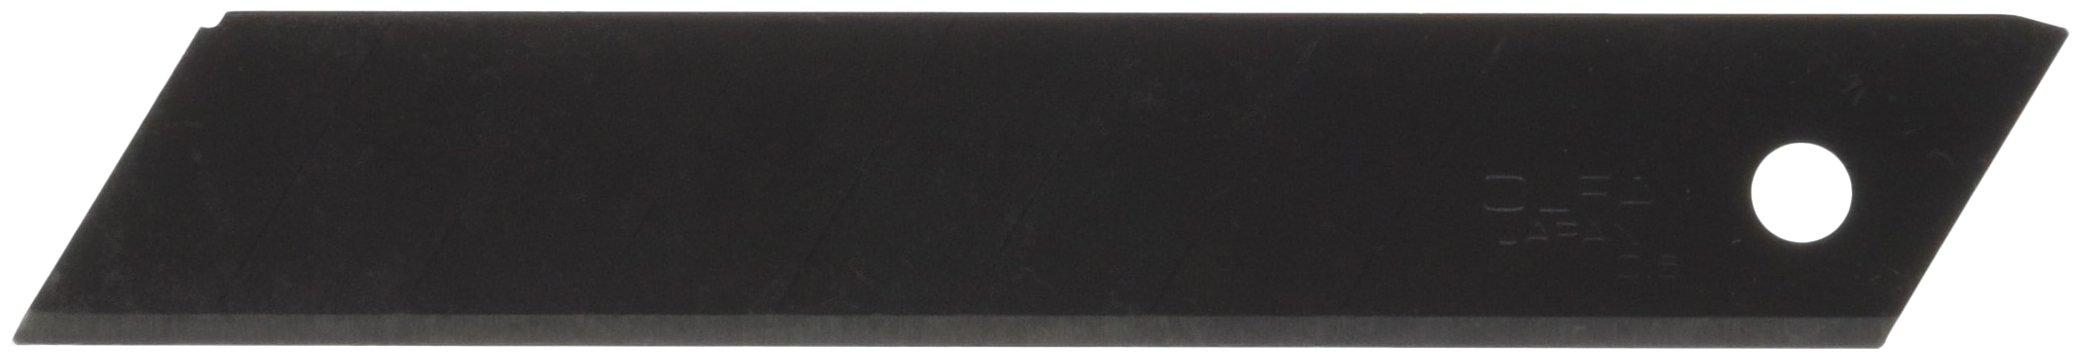 Olfa 1123432 LBB/CP-100 18mm Ultra Sharp Snap-Off Blade (100 Pack)